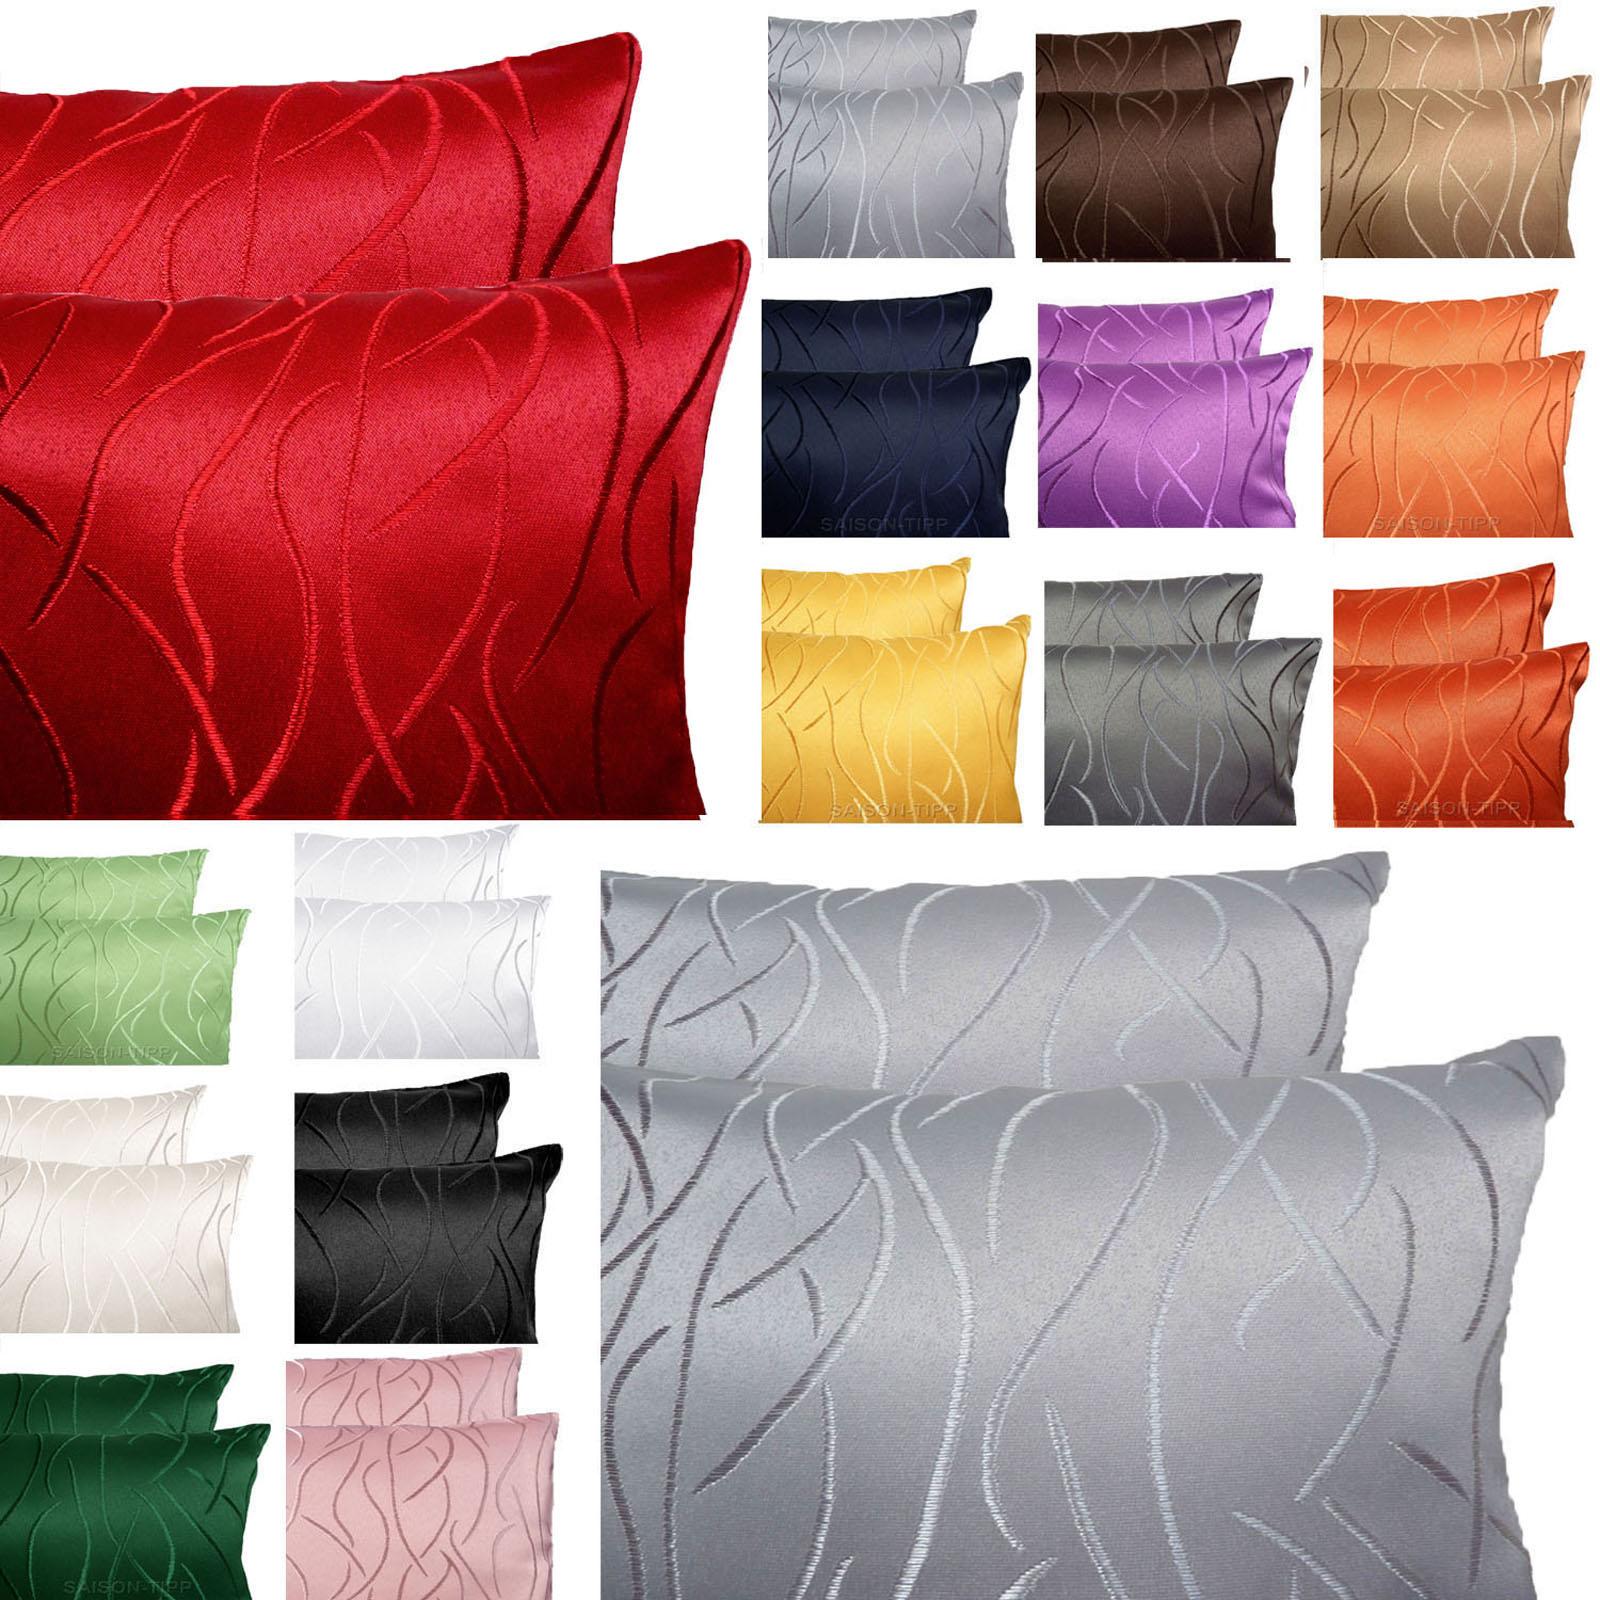 swing wellen kissenh lle 2 st ck modern streifen kissen kissenbezug dekokissen ebay. Black Bedroom Furniture Sets. Home Design Ideas